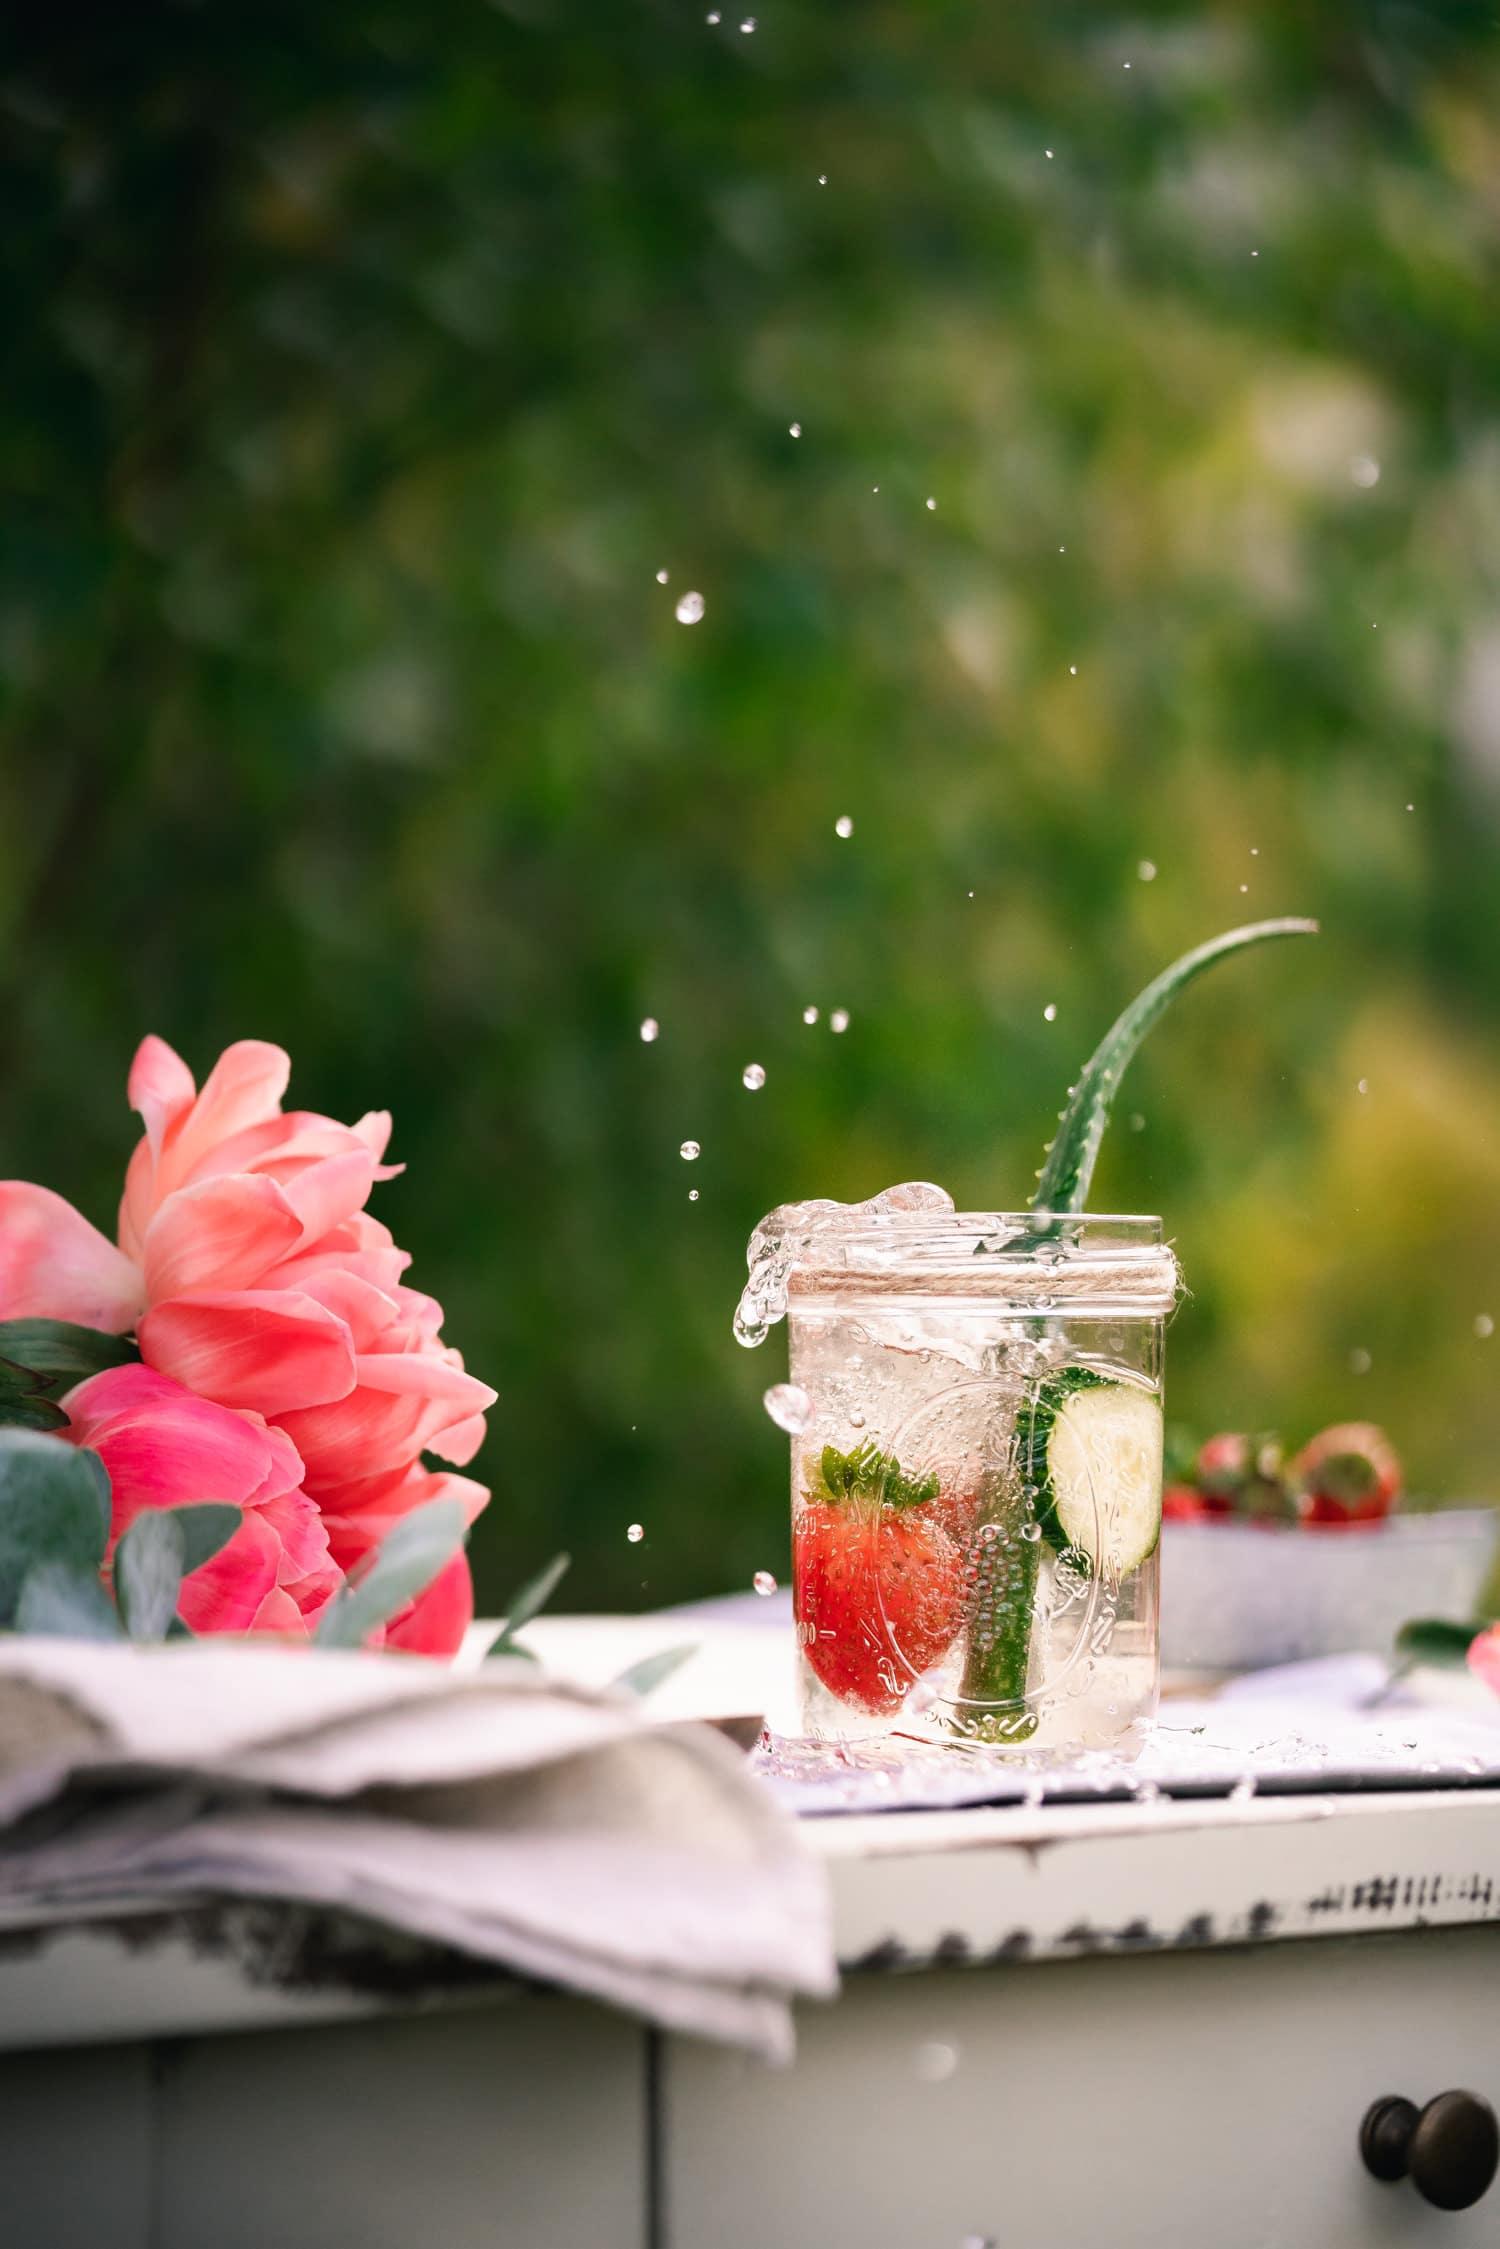 Aloe Vera Saft, Erdbeeren und Gurke